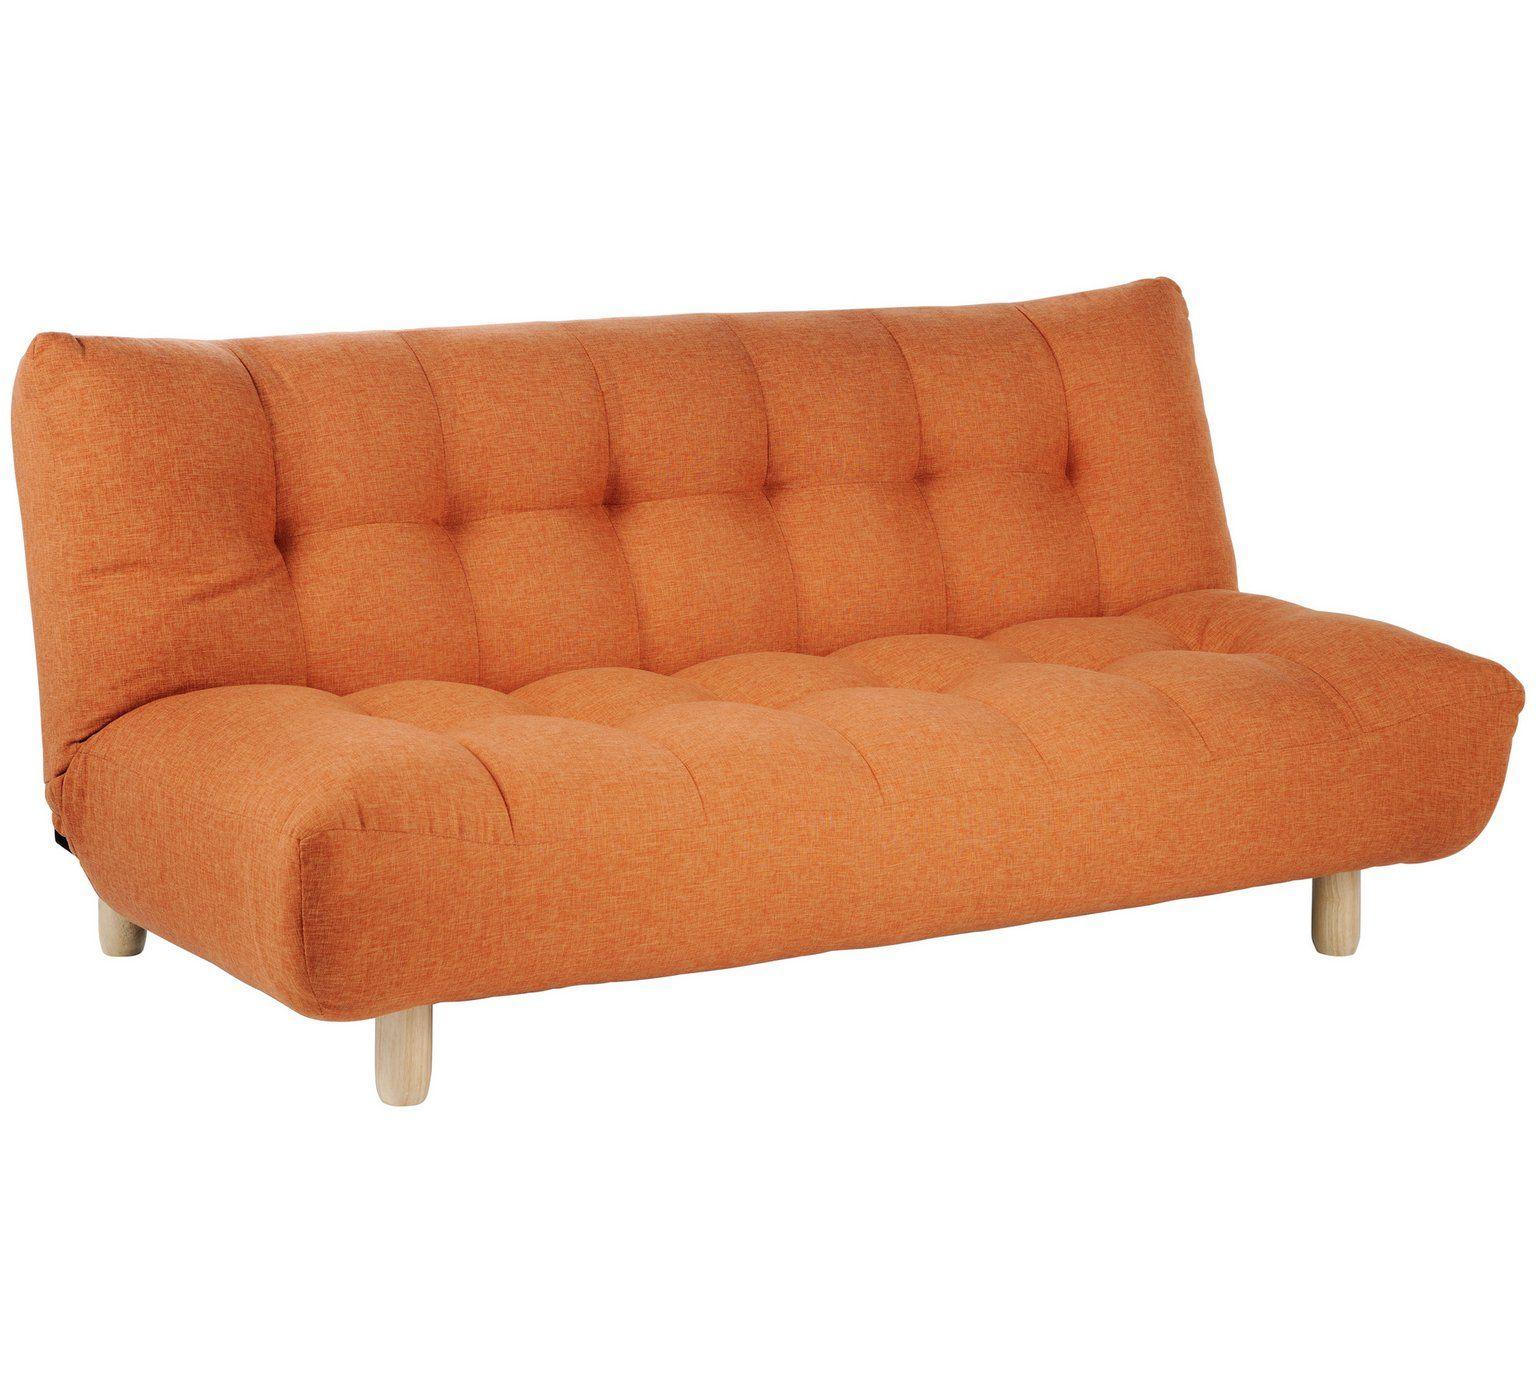 Buy Habitat Kota 3 Seater Fabric Sofa Bed Orange Sofa Beds Sofa Bed Orange Small Sofa Bed Fabric Sofa Bed